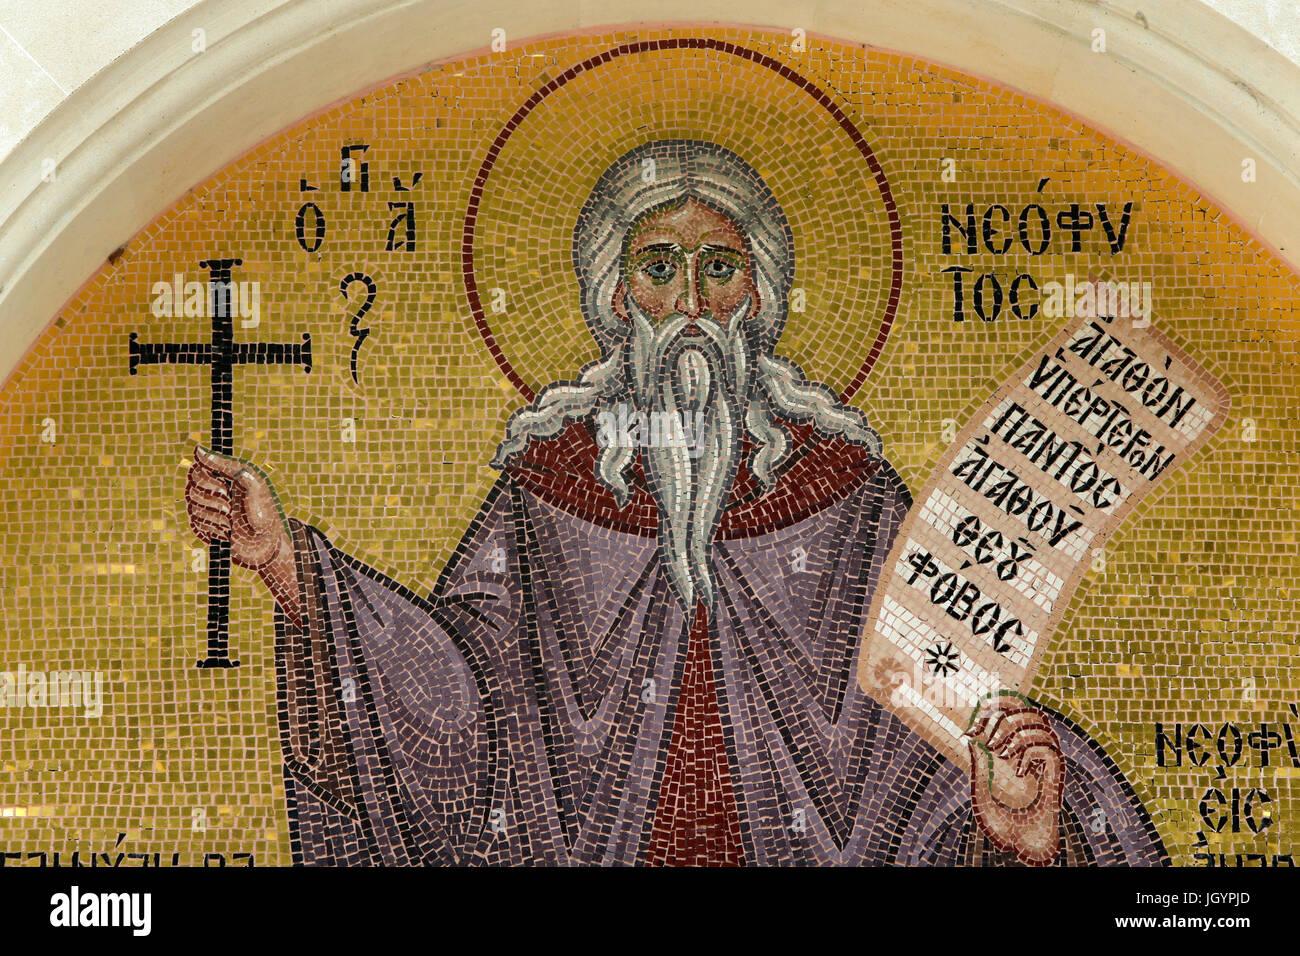 Troodithissa monastery mosaic. Saint Neophyte. Cyprus. - Stock Image